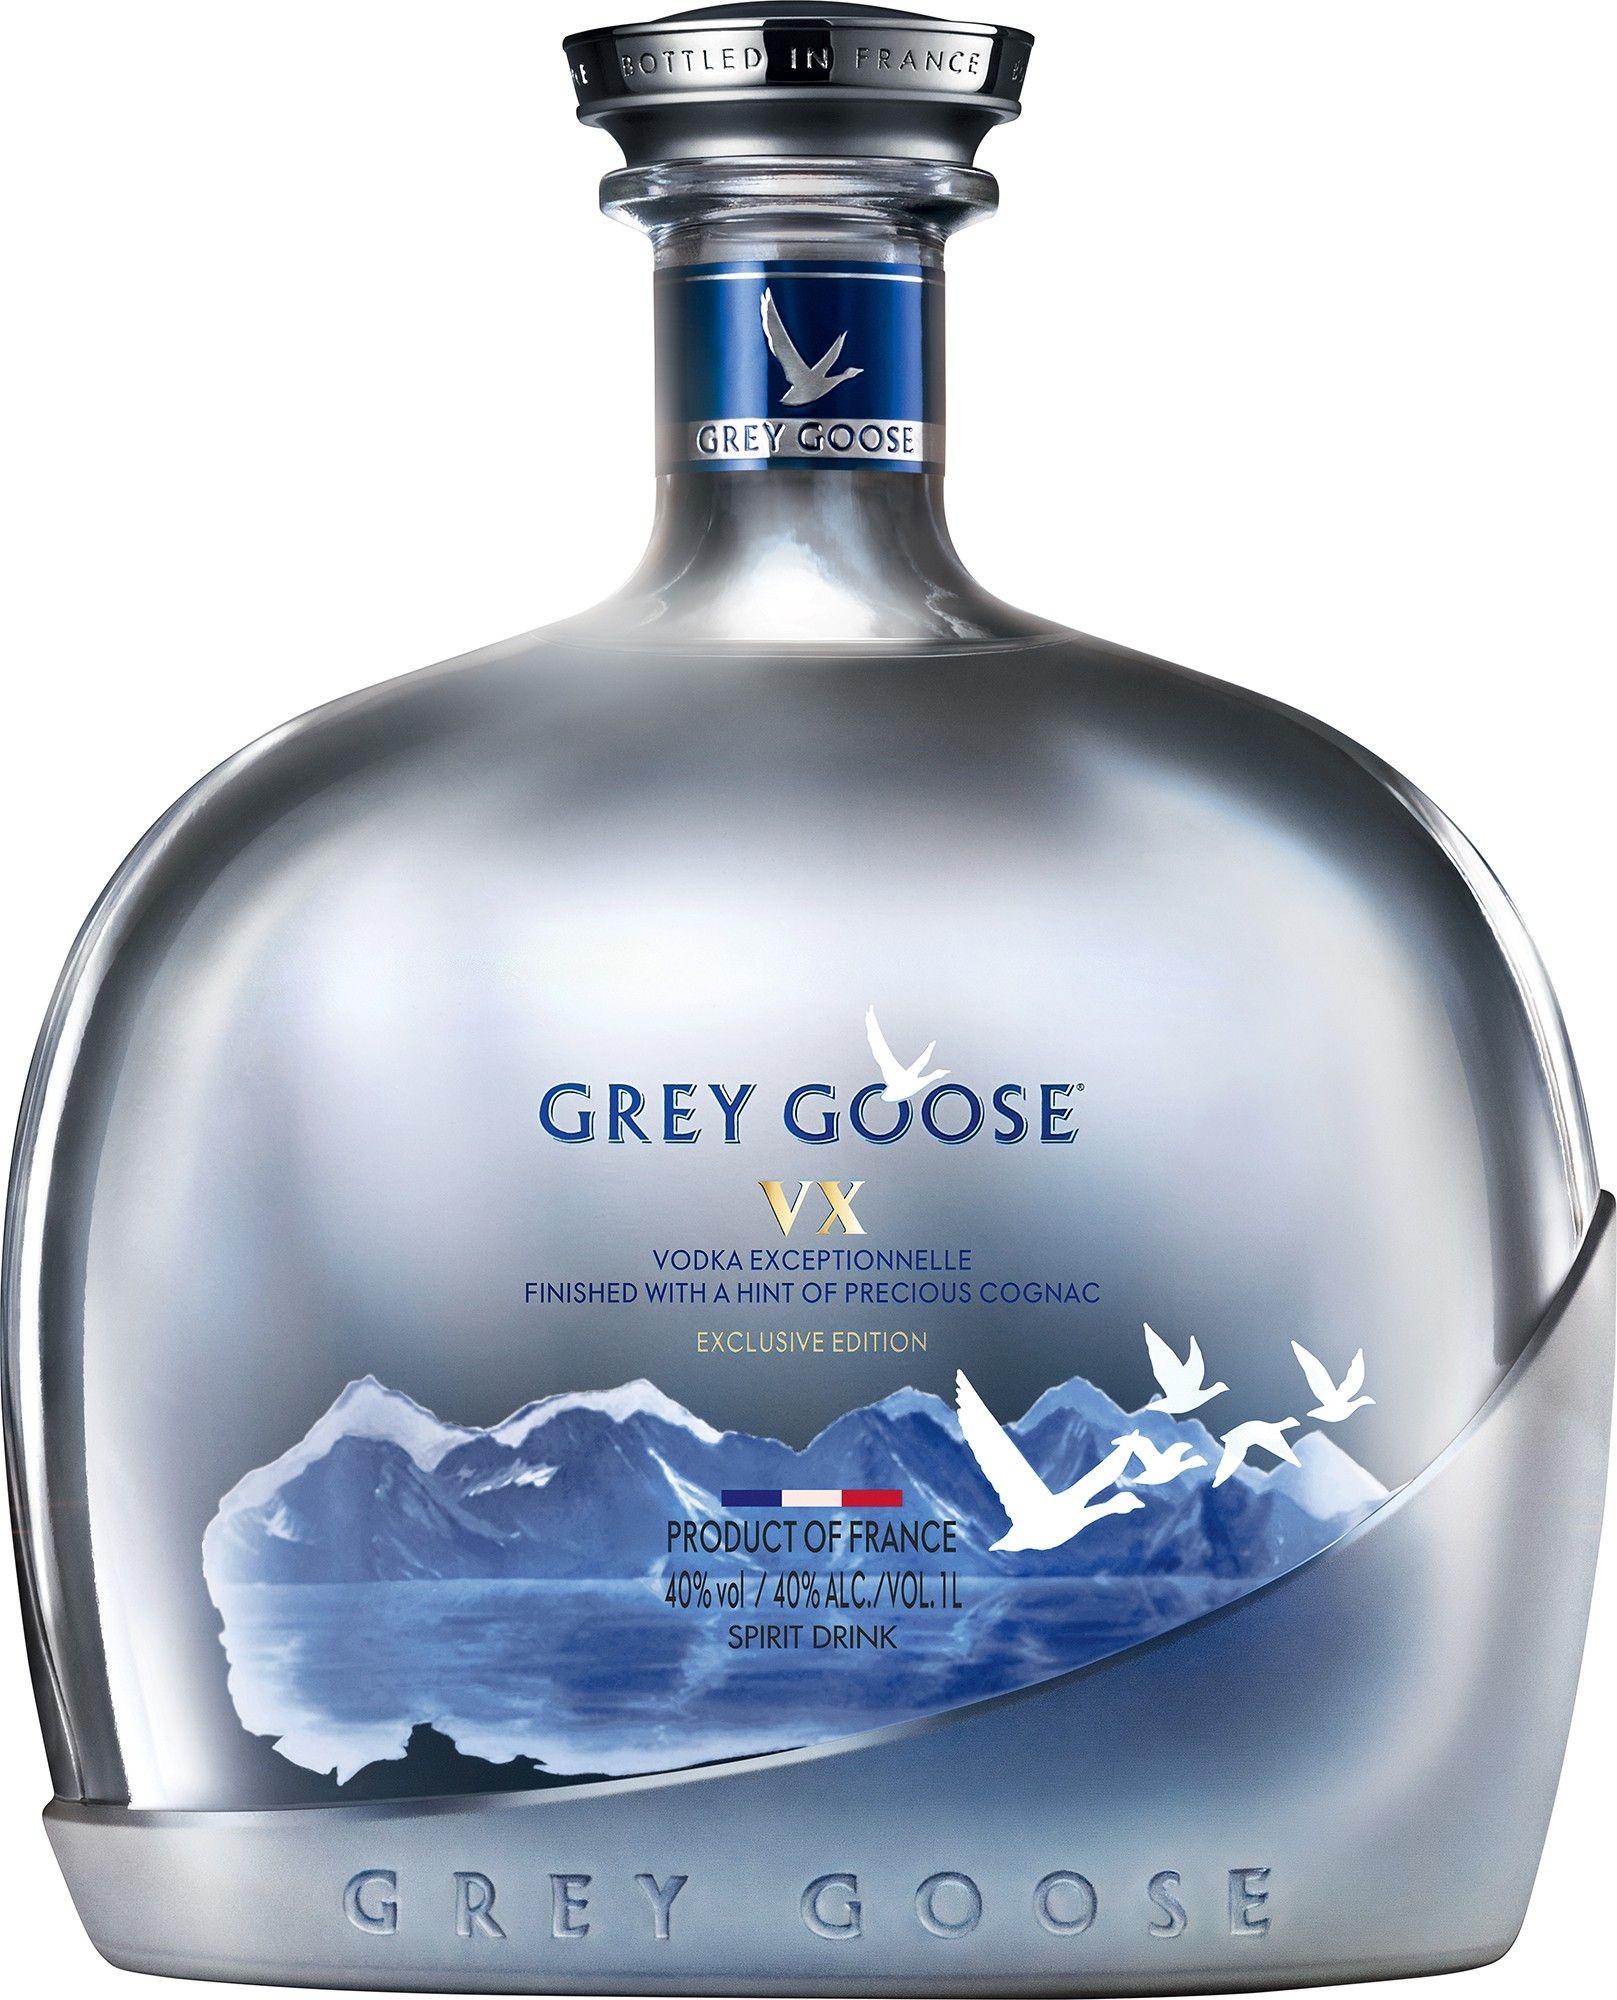 Grey Goose VX Vodka with Cognac; Vodka with a hint of Cognac | spiritedgifts.com